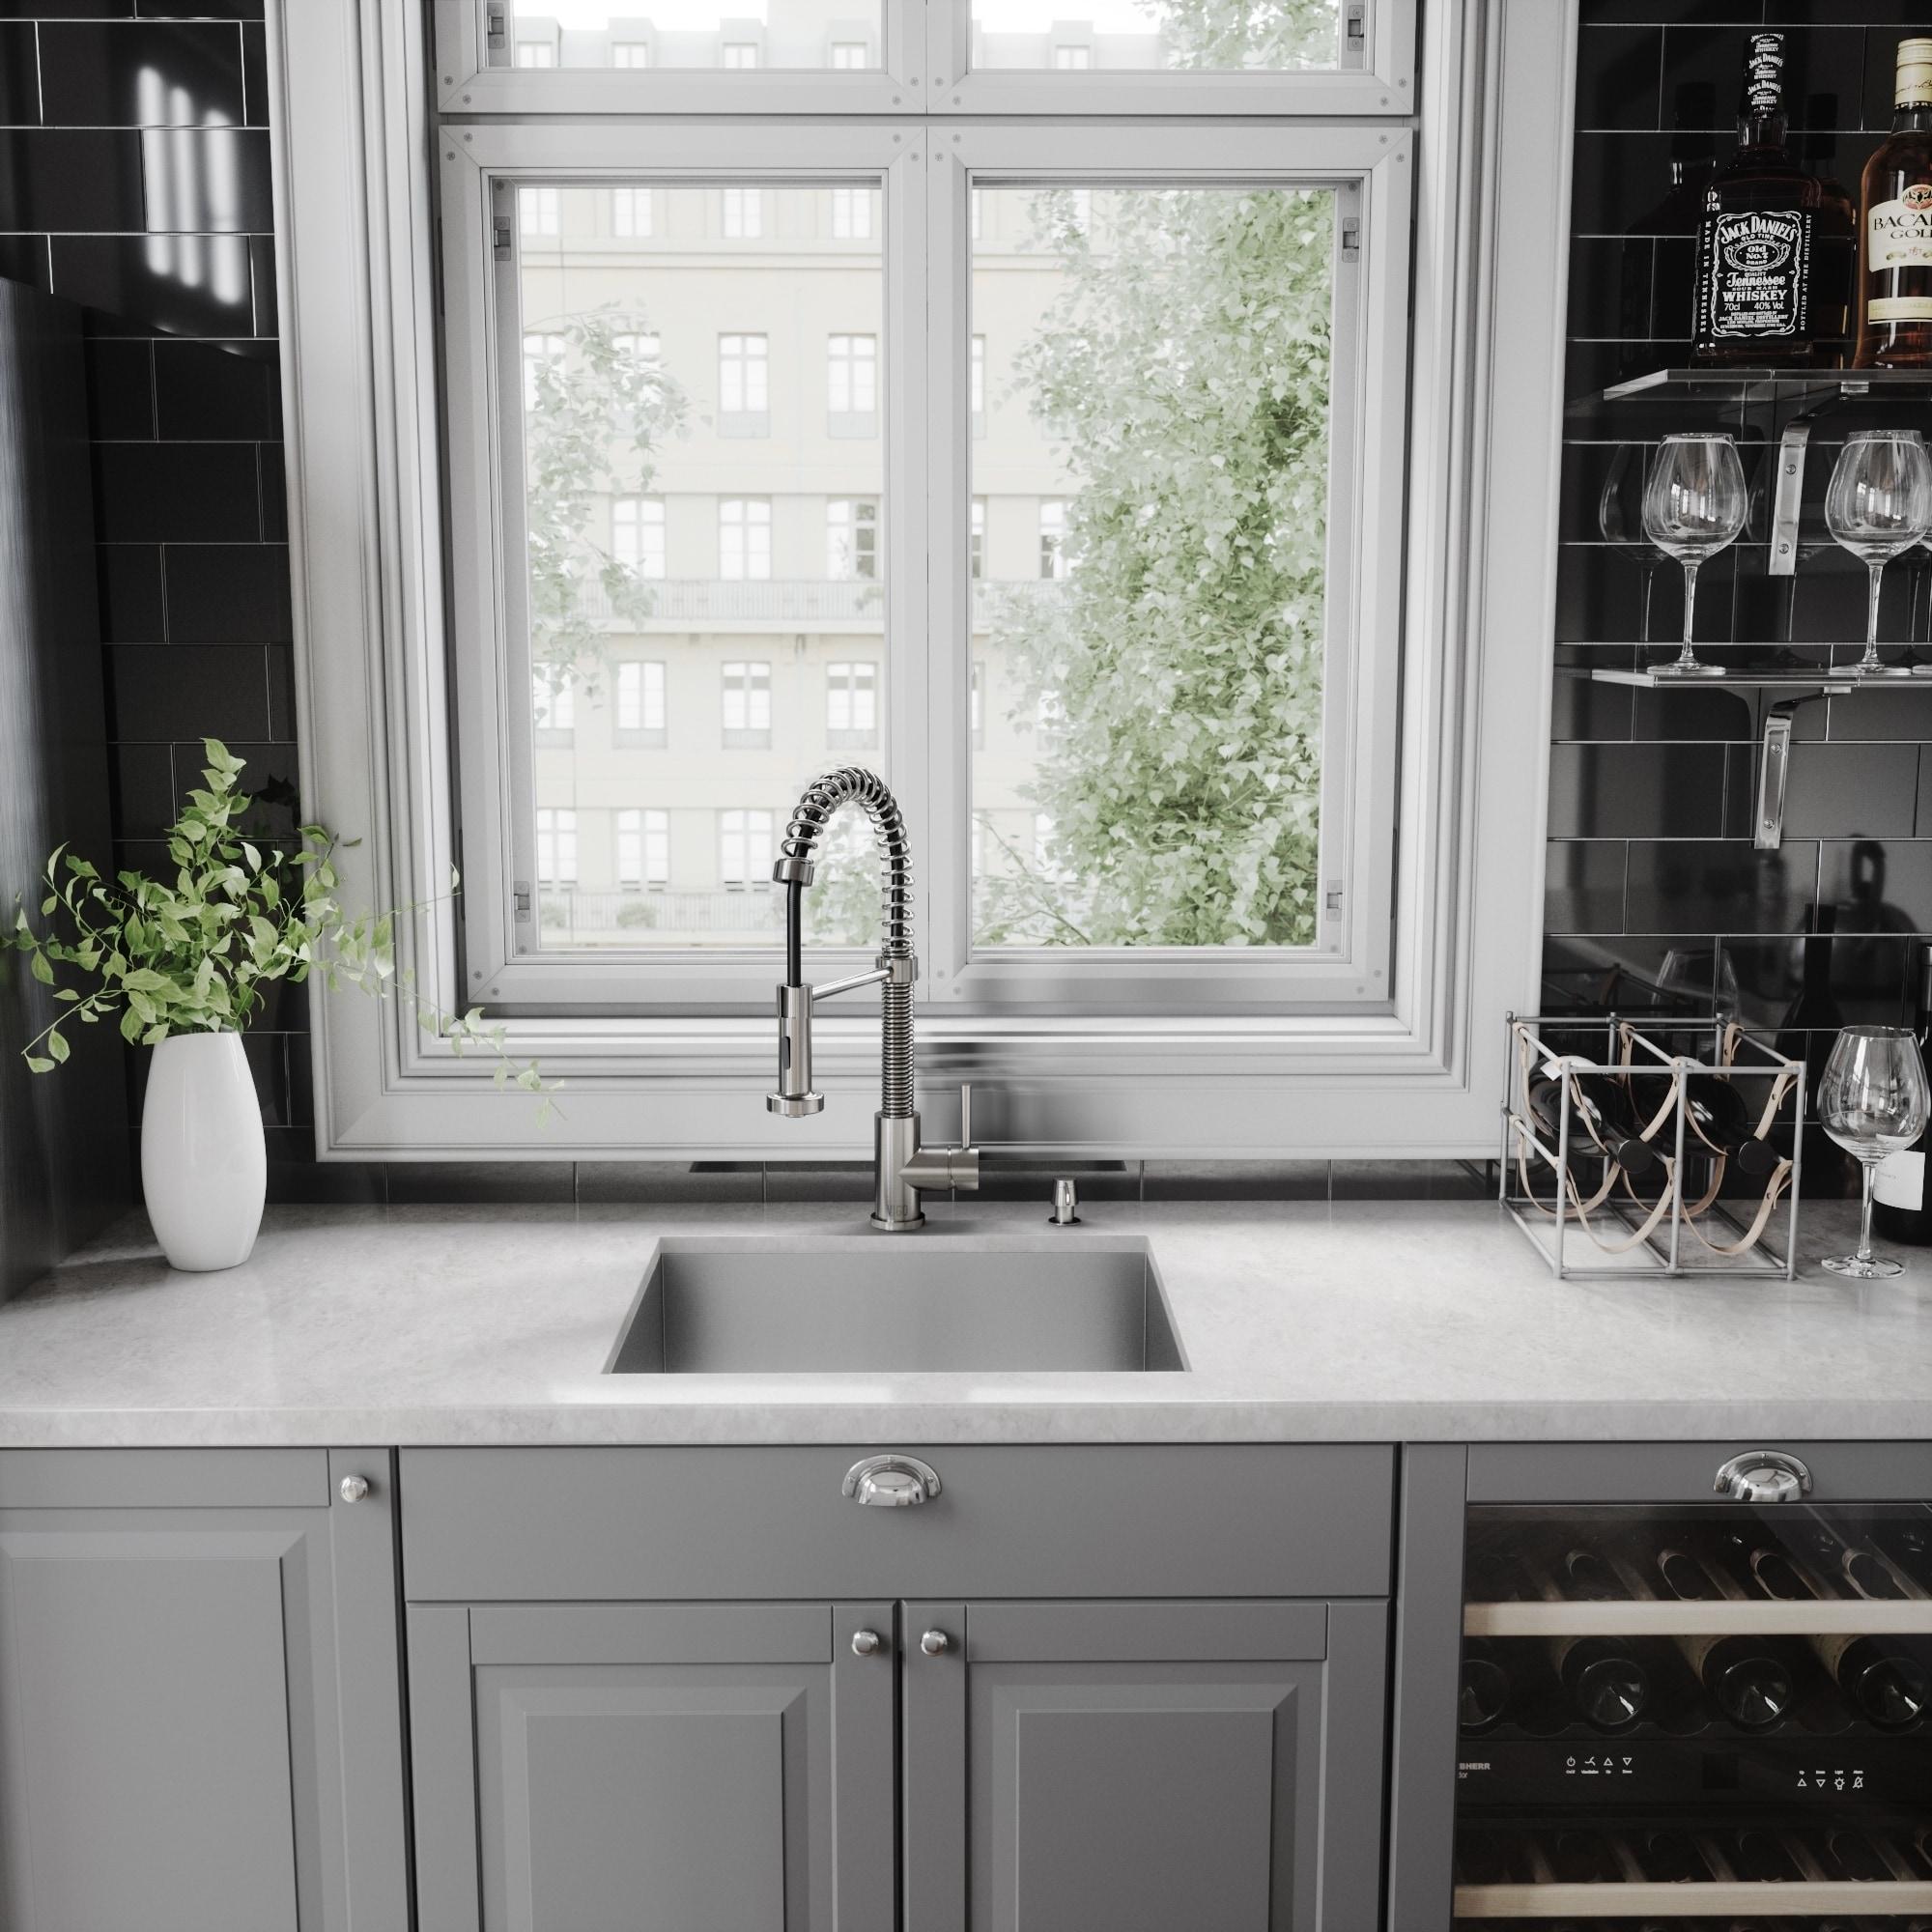 Shop VIGO Edison Stainless Steel Pull Down Spray Kitchen Faucet